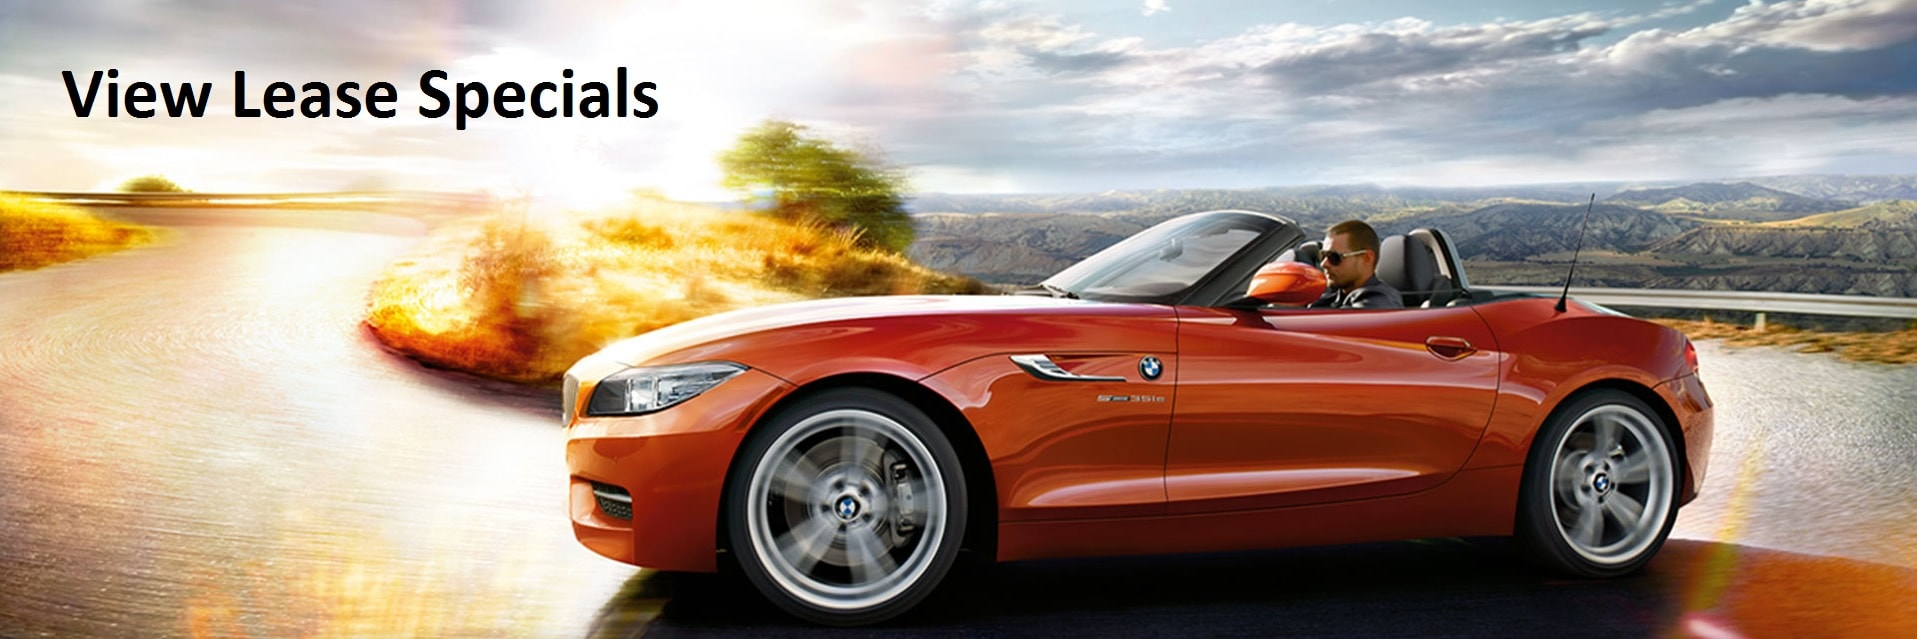 Buy or Lease BMW Z4 Series Los Angeles Thousand Oaks Westlake